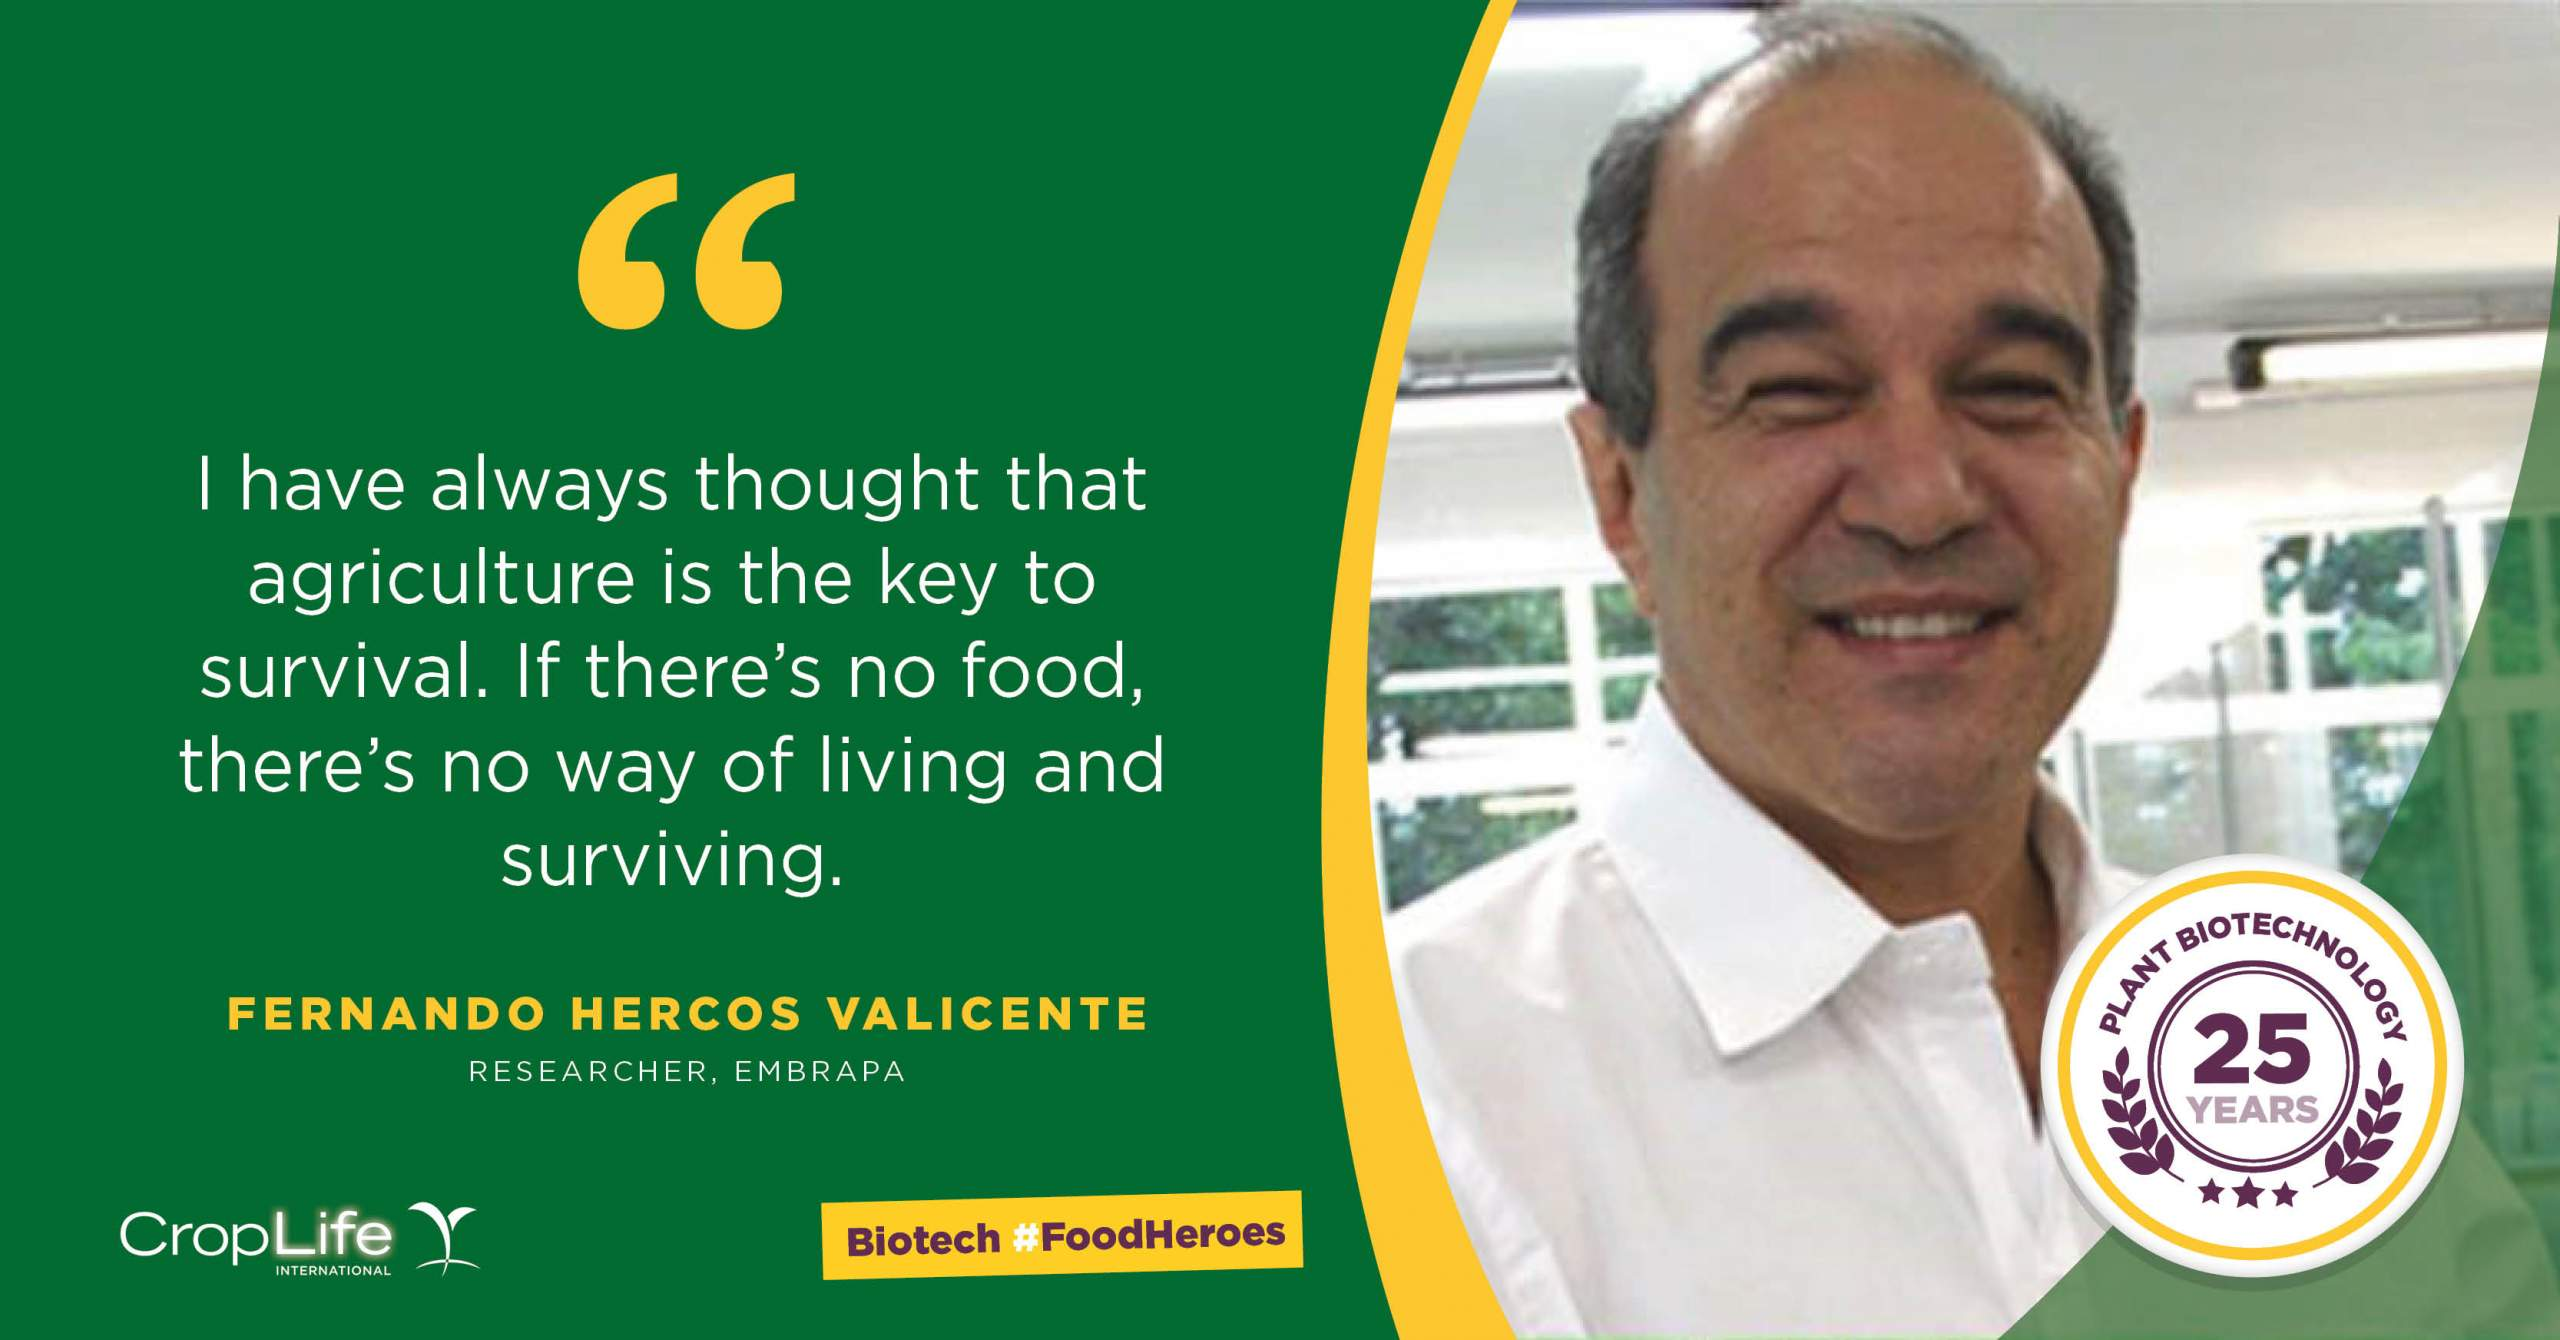 Fernando Hercos Valicente